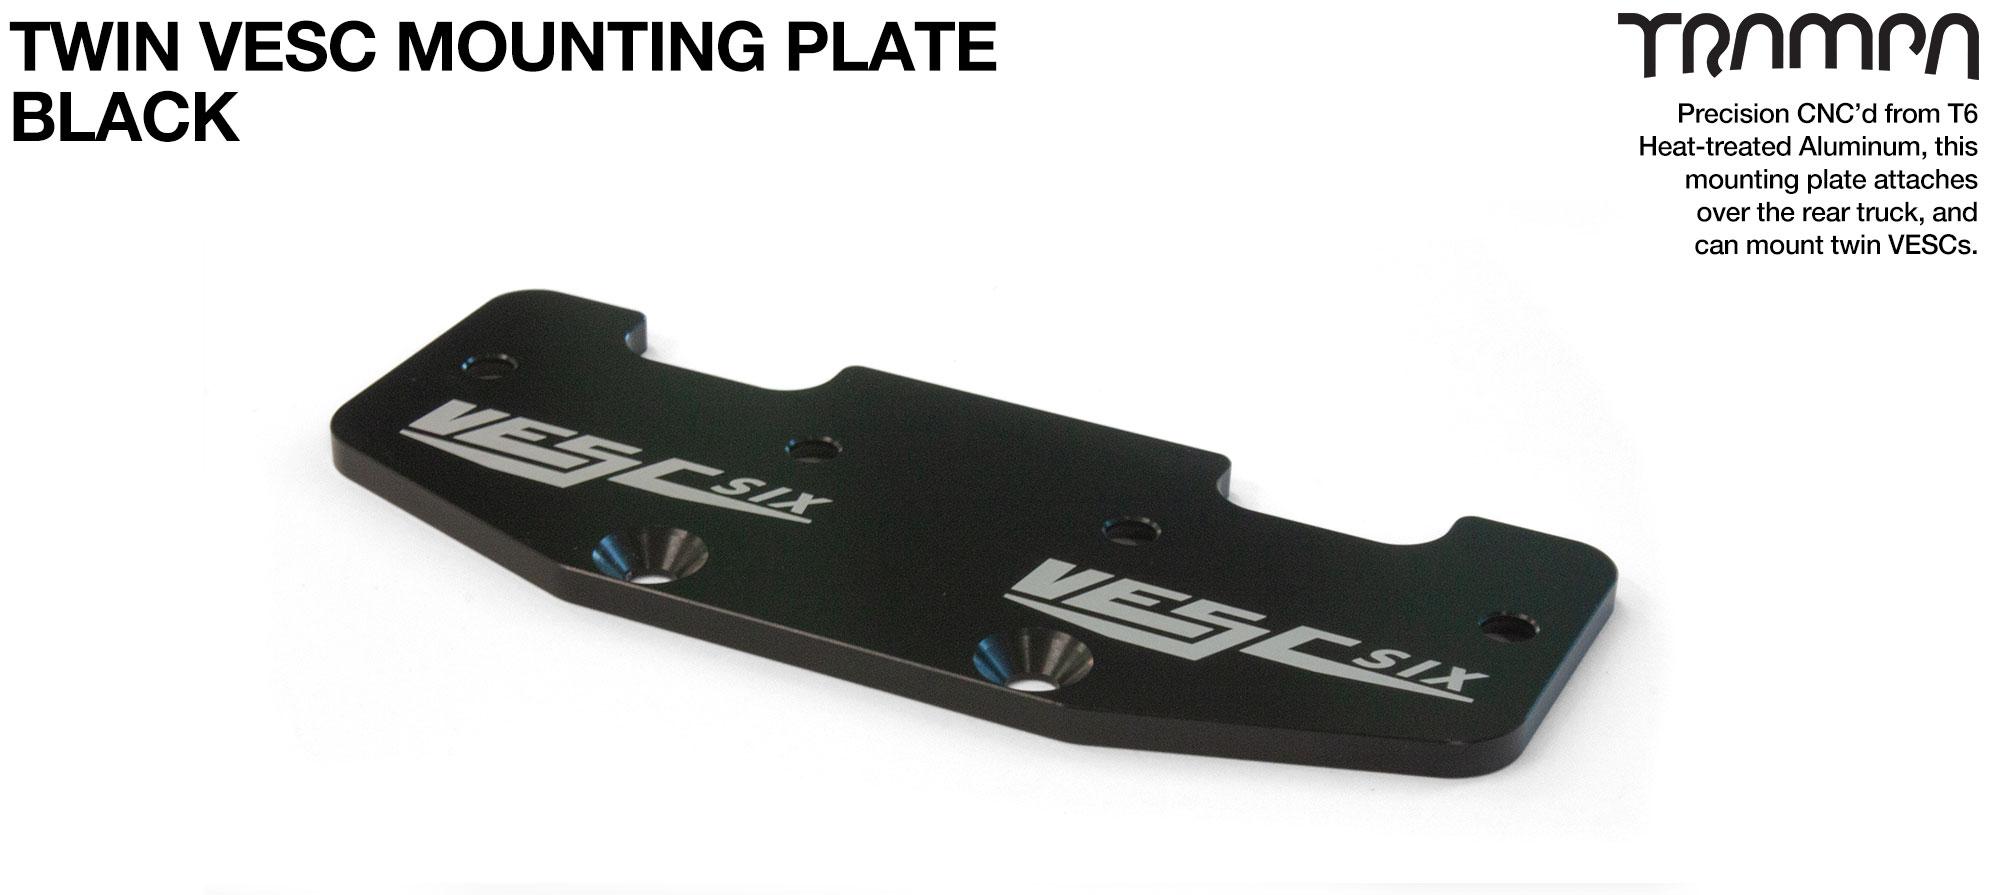 ALUMINIUM mounting Plate for TWIN VESC